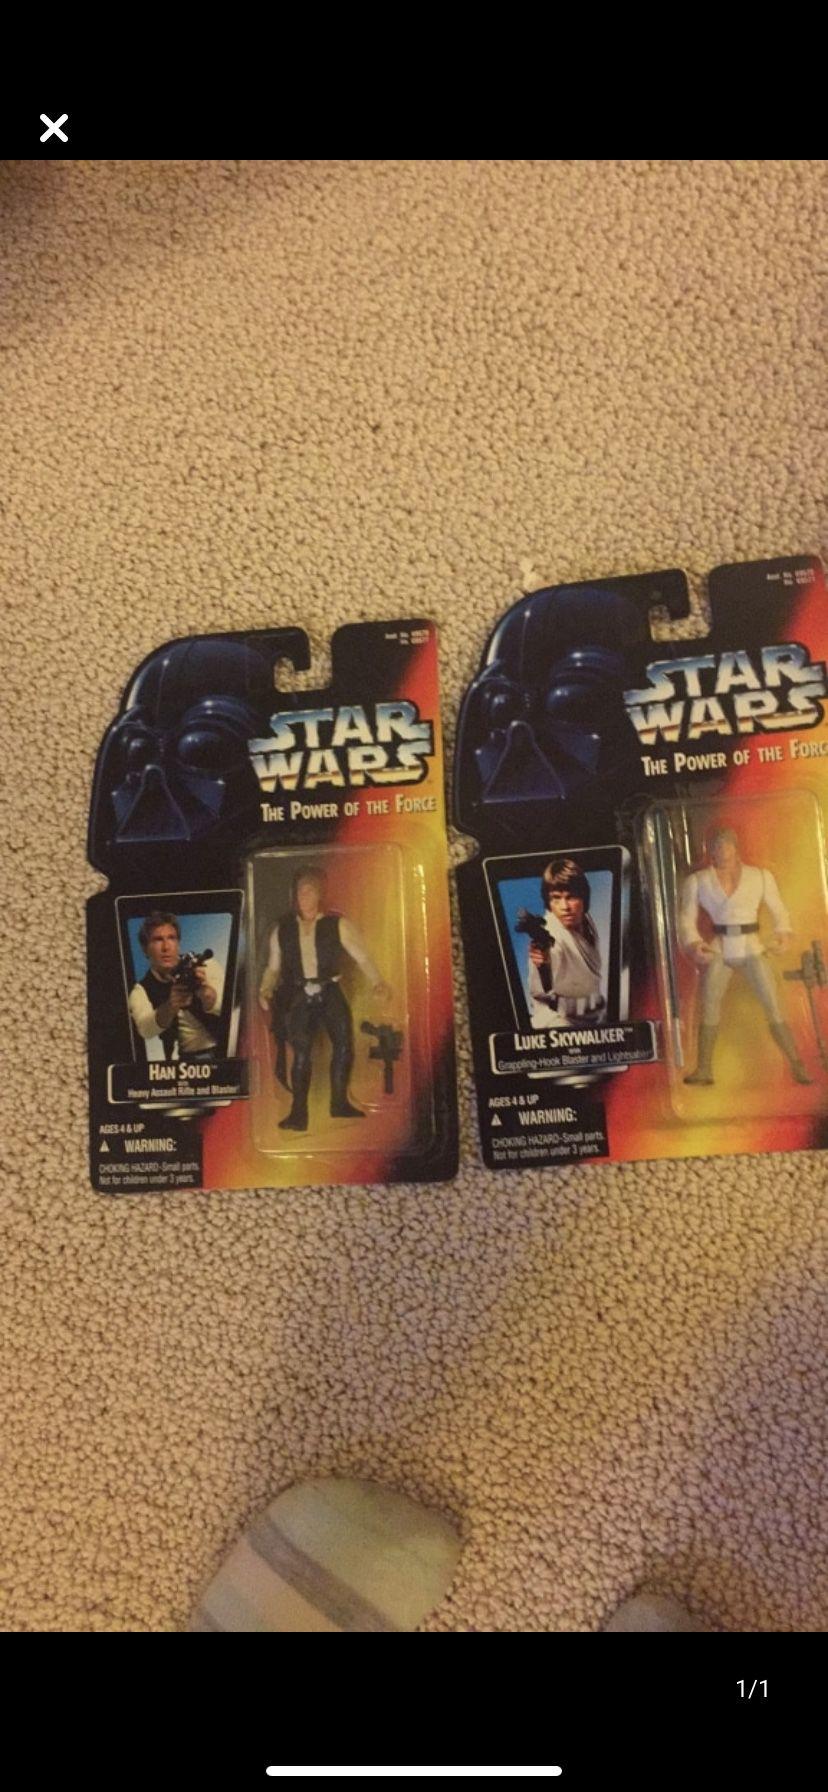 Star Wars unopened figures Luke Skywalker and Han Solo